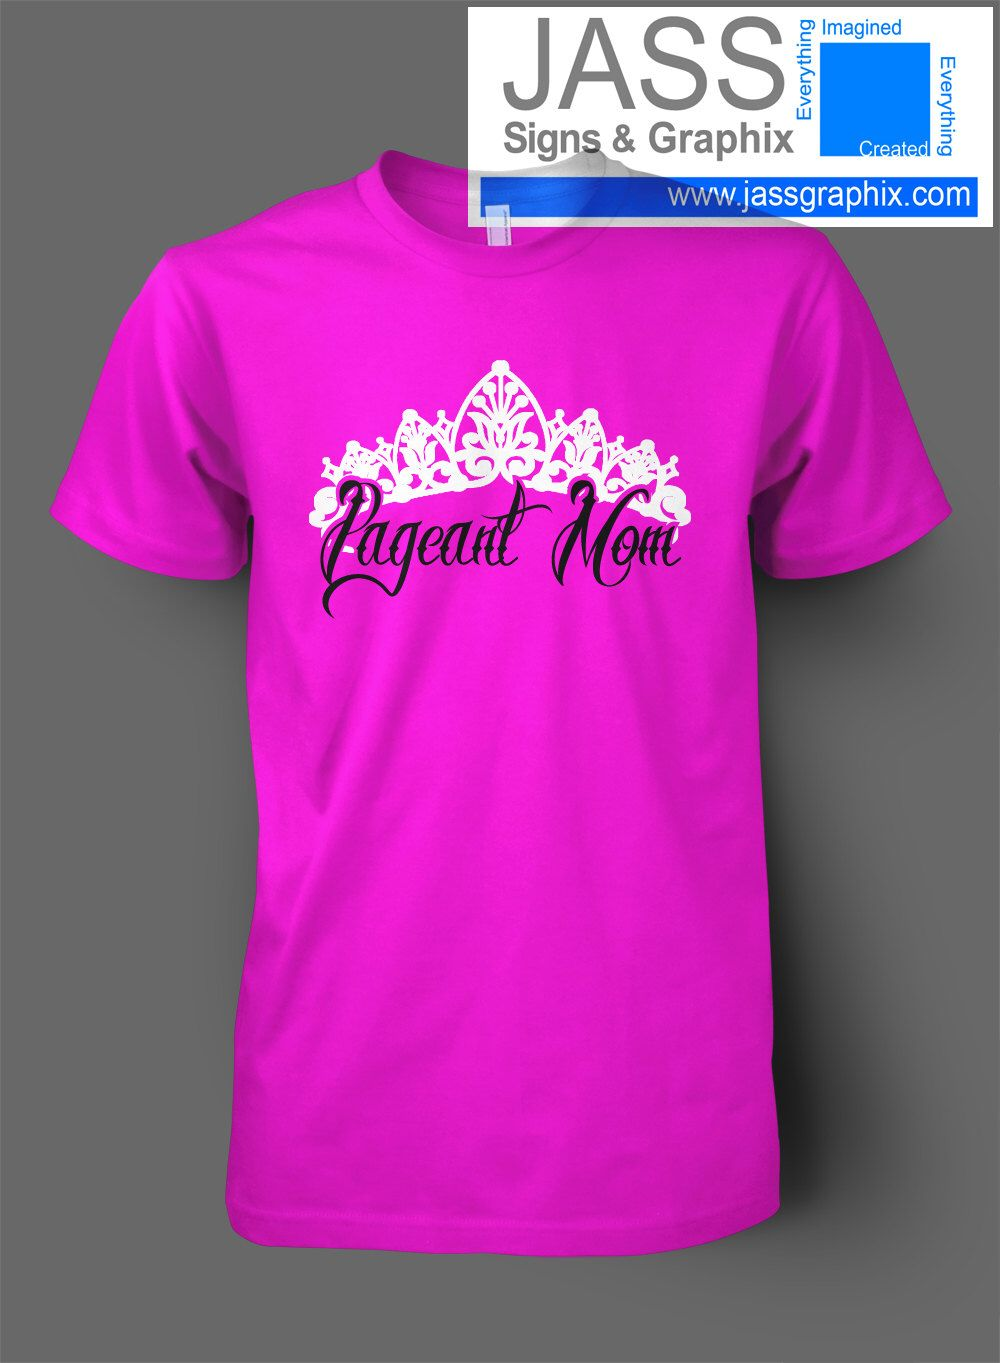 Black keys t shirt etsy - Pageant Mom Tee Shirts By Logisticalgraphix On Etsy Https Www Etsy